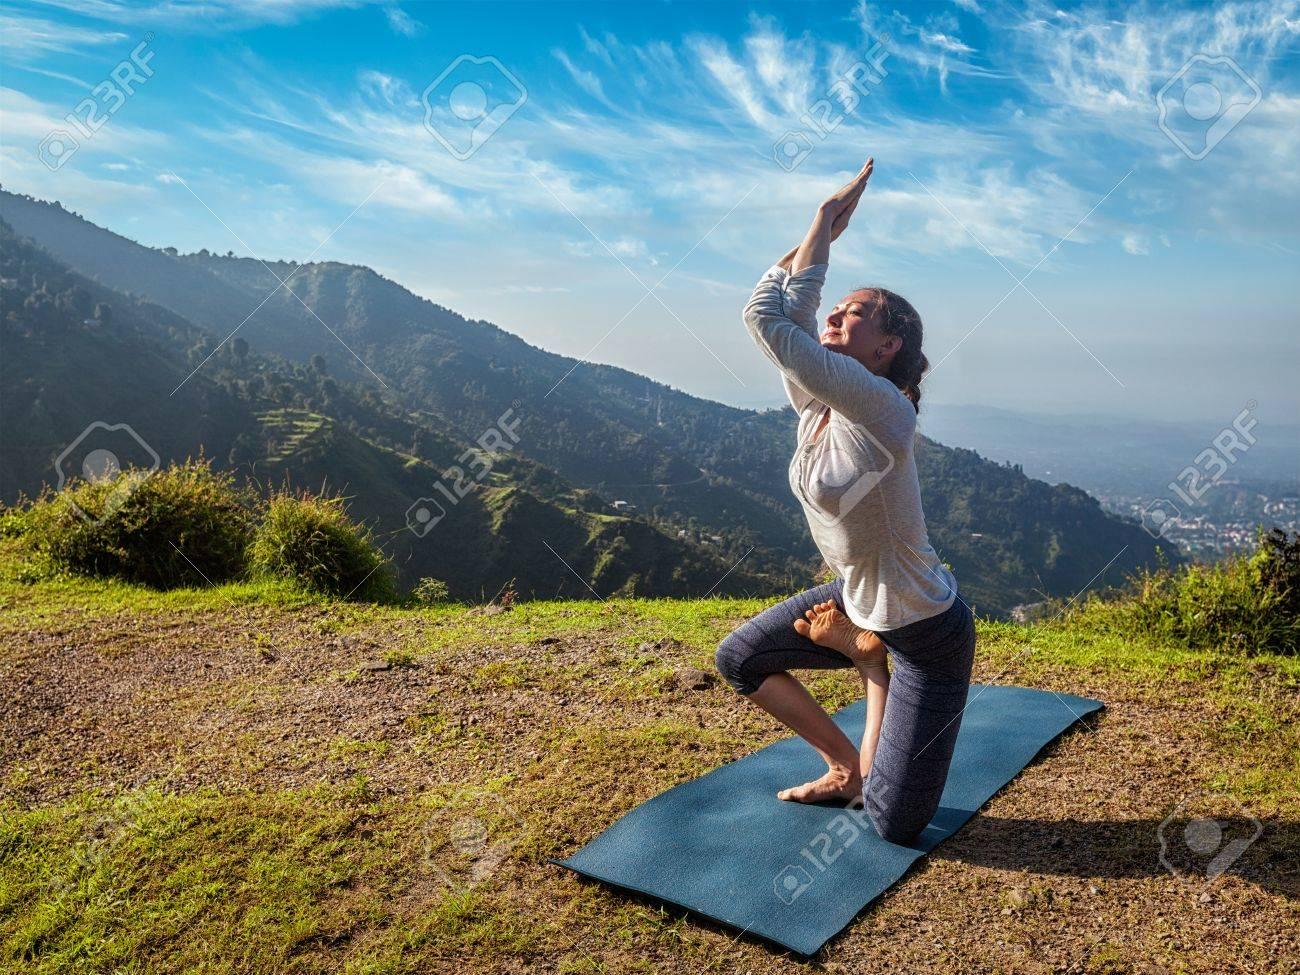 Young Woman Doing Ashtanga Vinyasa Yoga Advanced Difficult Asana